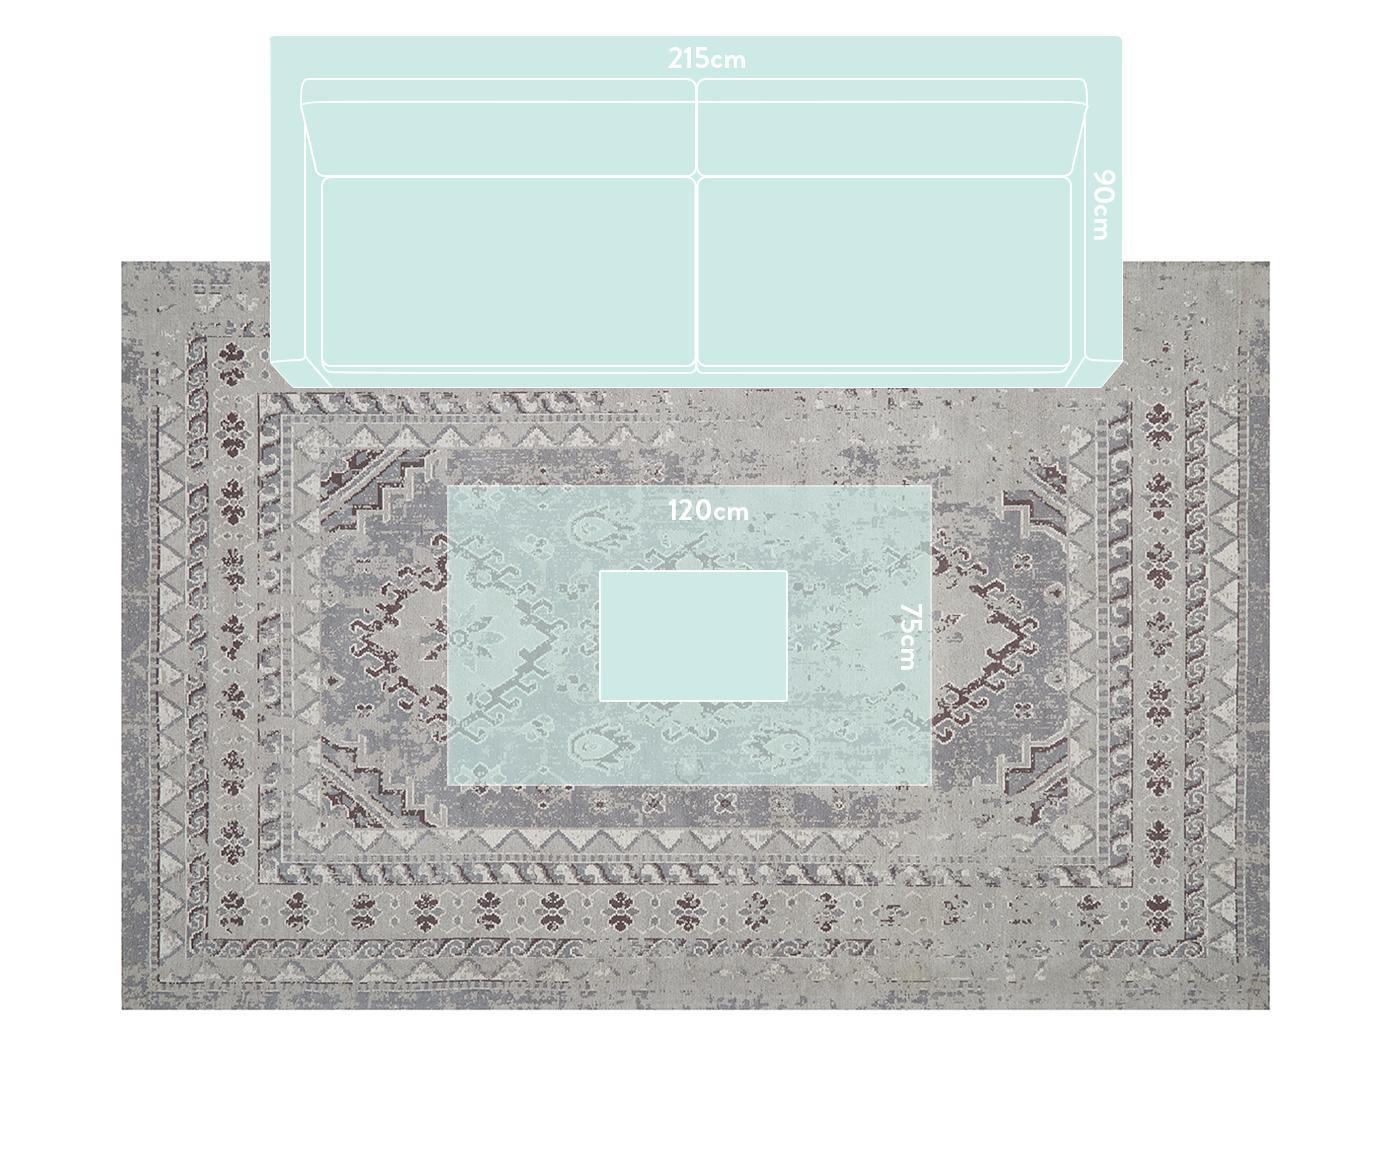 Vintage Chenilleteppich Rebel in Grau, Flor: 95% Baumwolle, 5% Polyest, Hellgrau, Creme, B 200 x L 300 cm (Größe L)